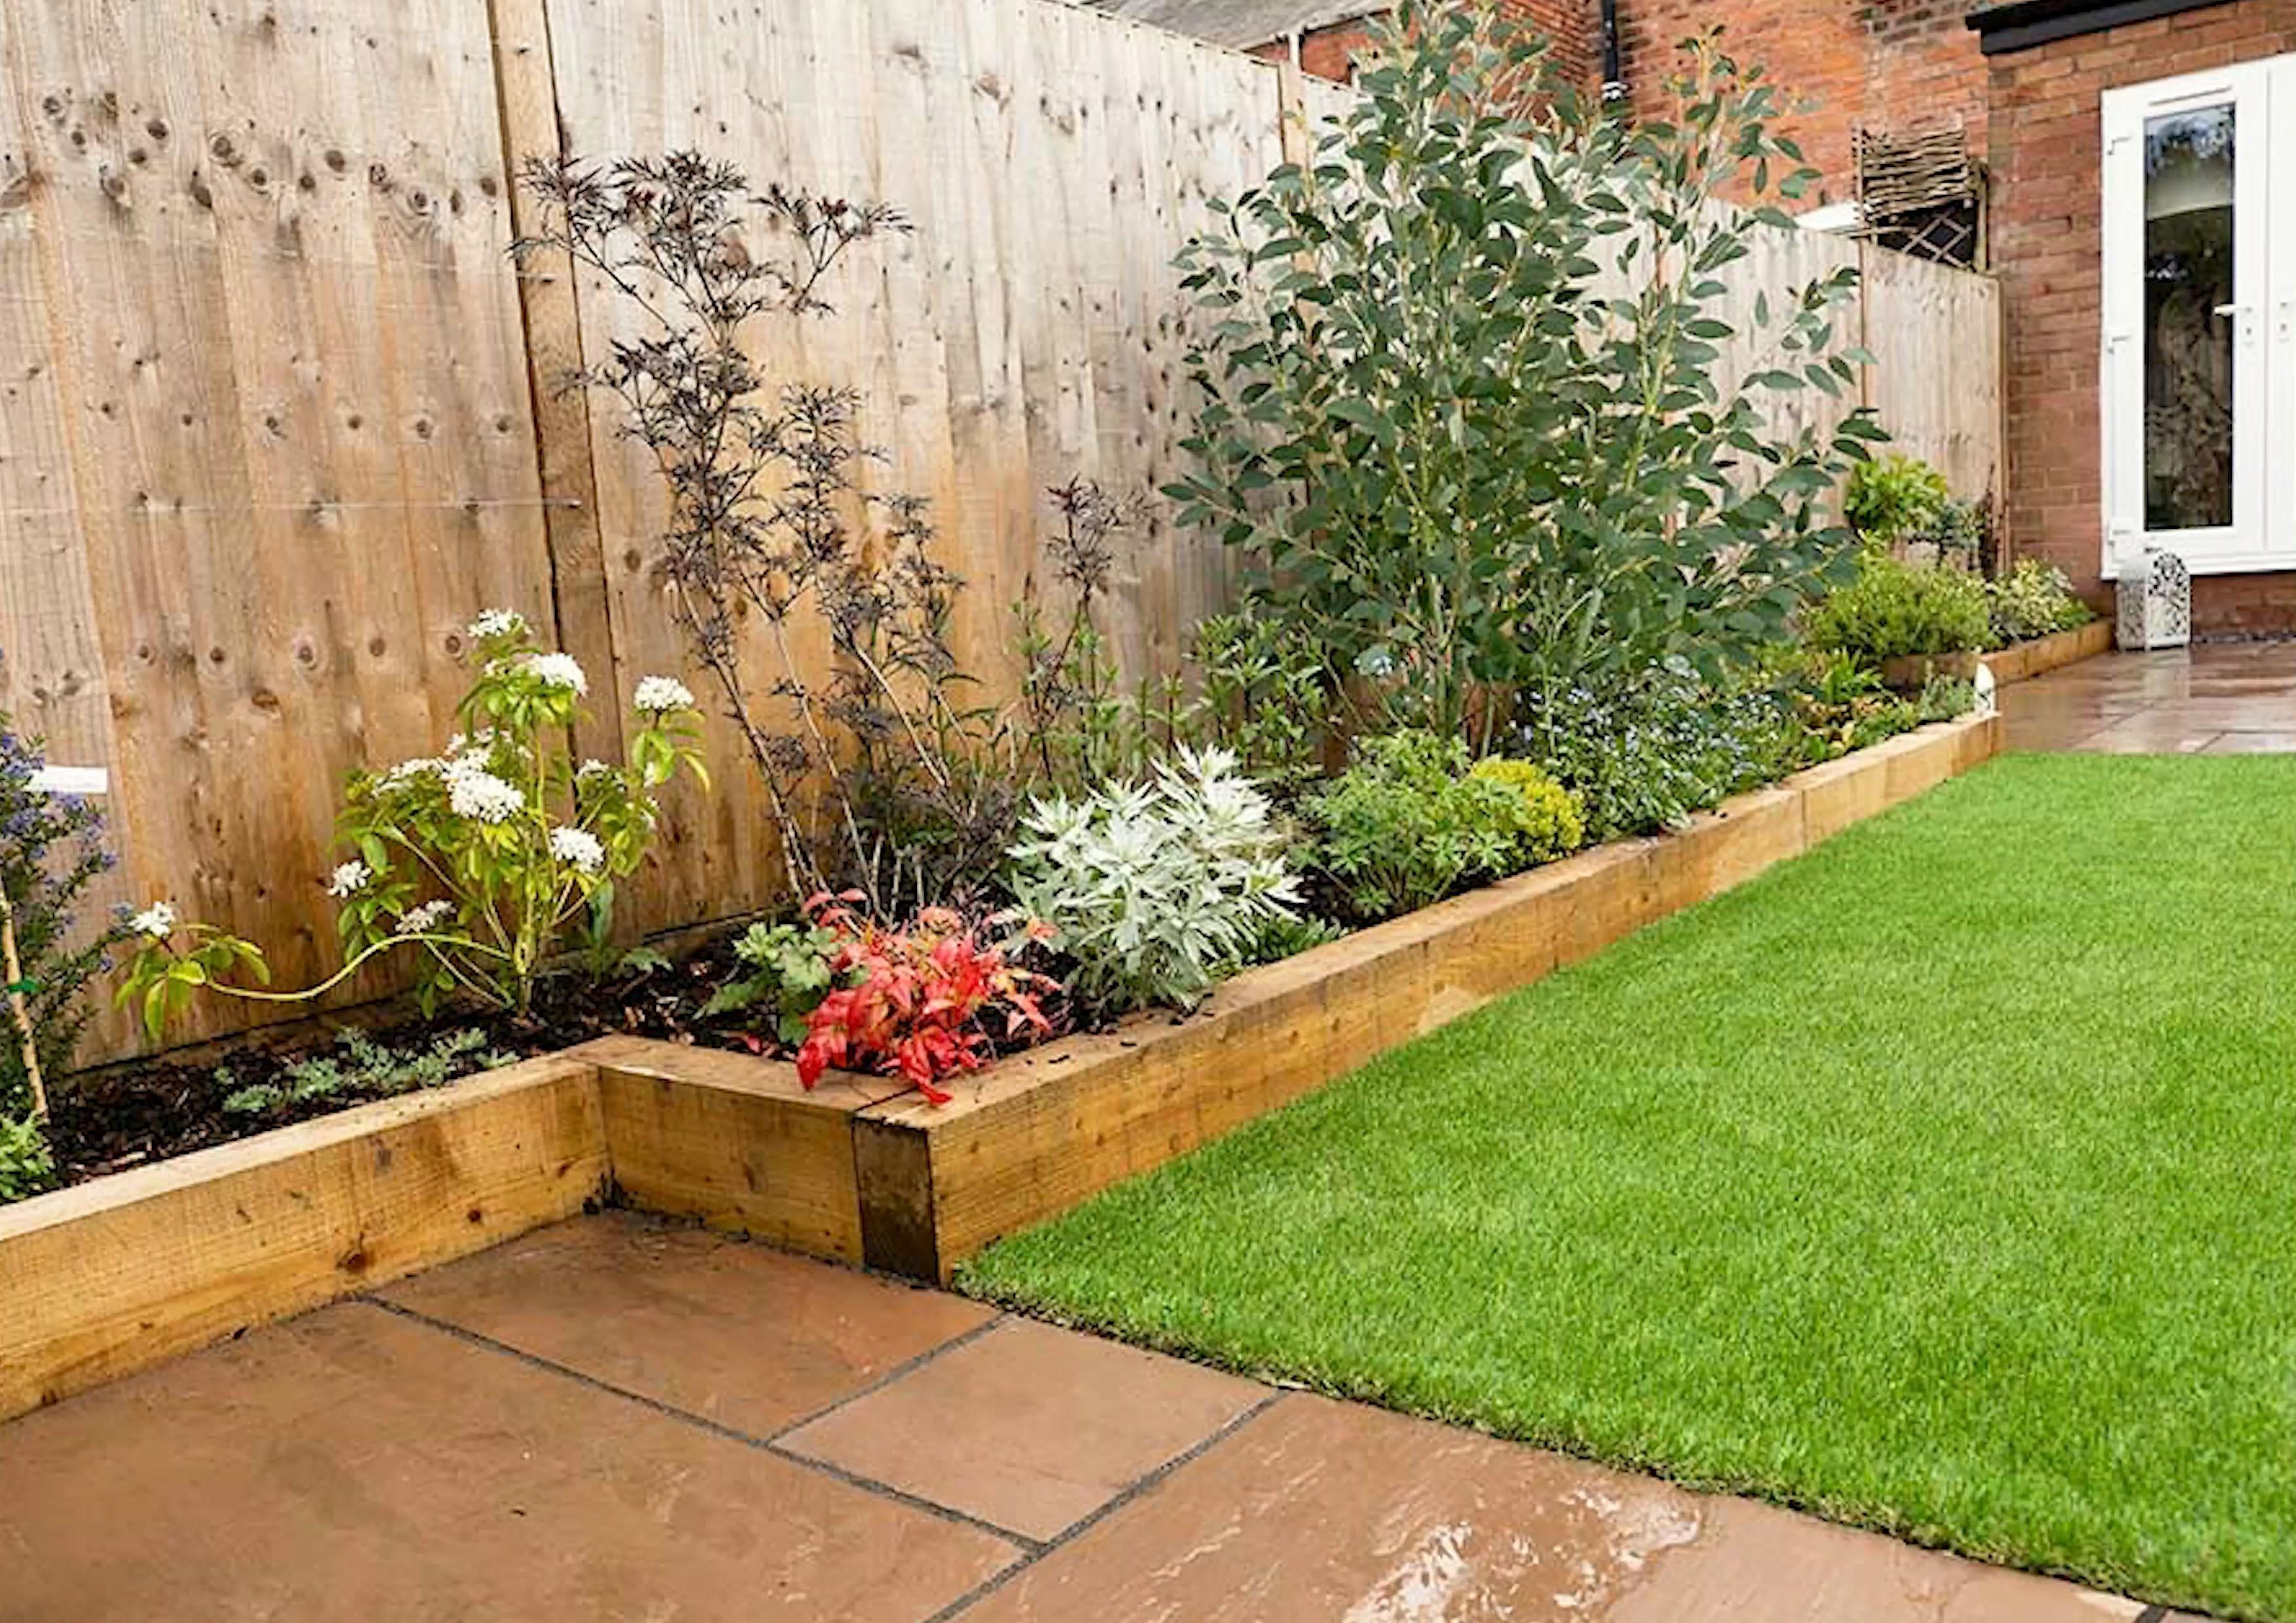 Photo of A Long Thin Garden Design and Installation in Shrewsbury, Shropshire.